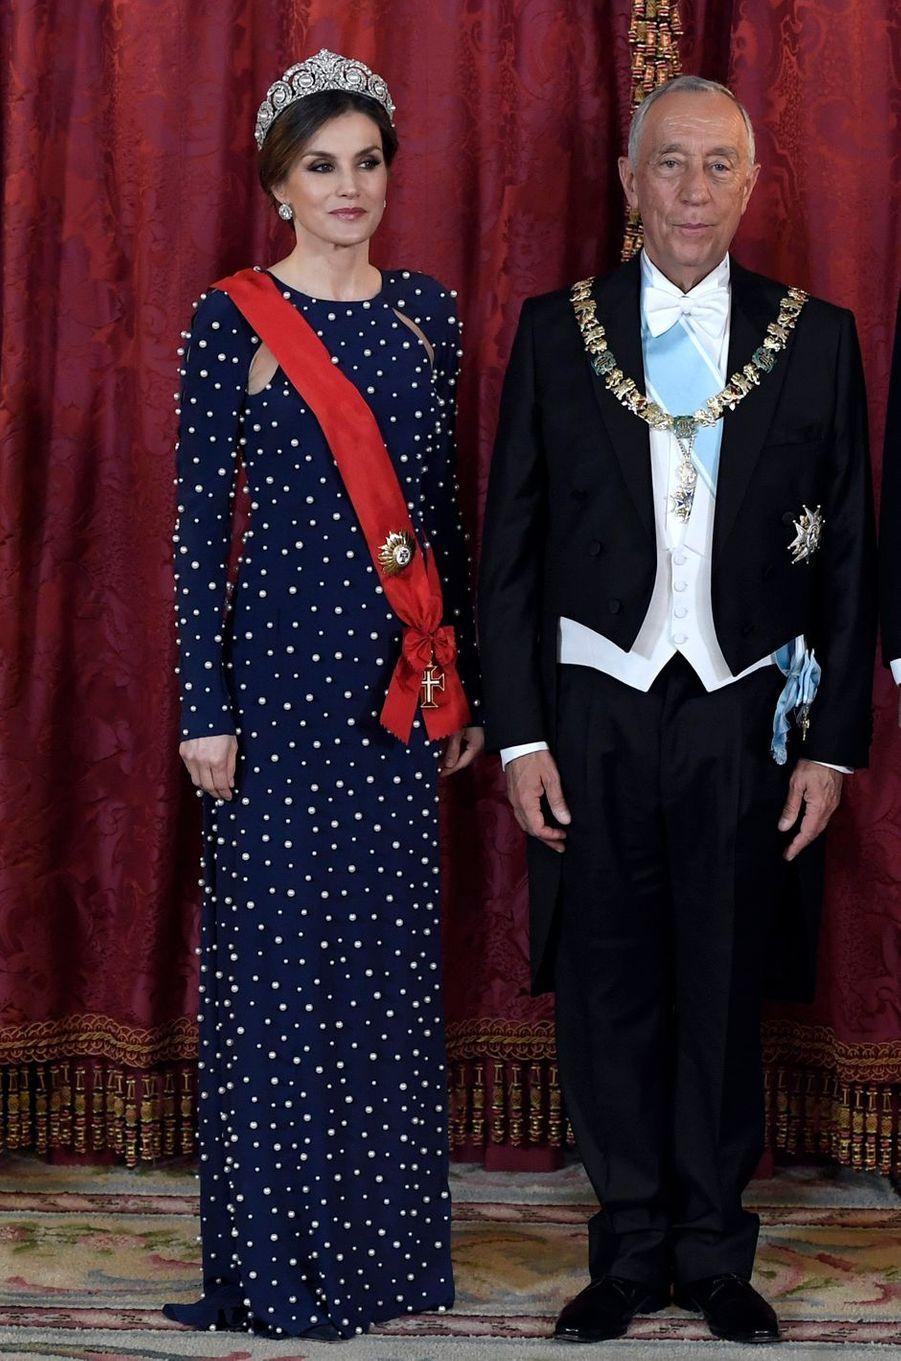 La reine Letizia d'Espagne, dans une robe Ana Locking, le 16 avril 2018